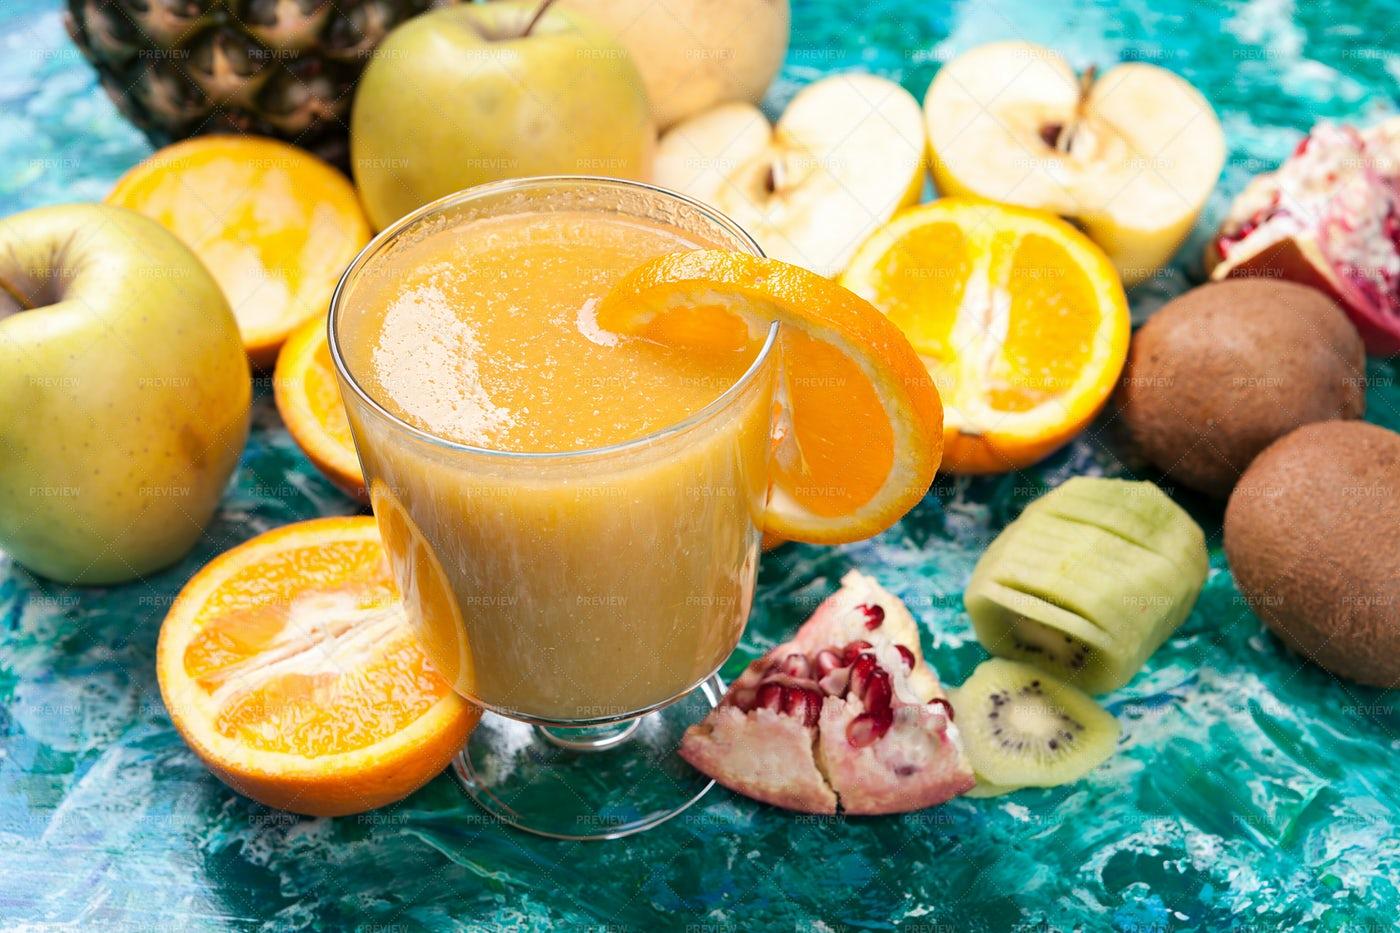 Vitamin Healthy Juice Next To Fruits: Stock Photos